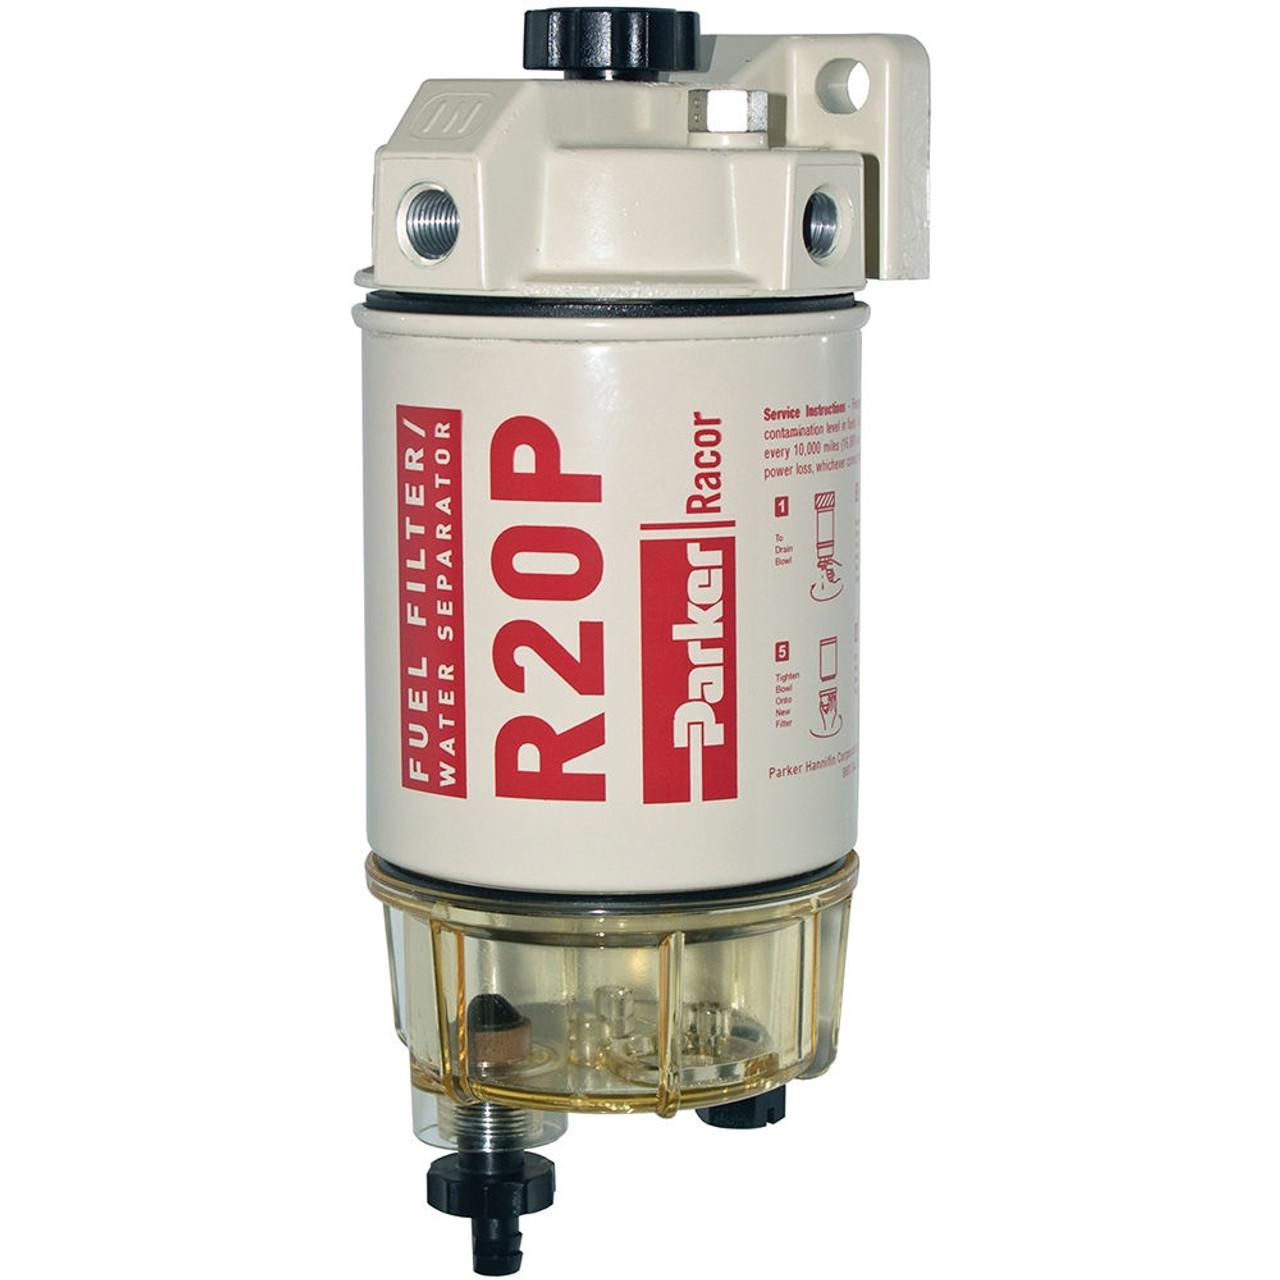 racor 200 series 30 gph low flow diesel fuel filter water separator 230 filter assembly [ 1000 x 1000 Pixel ]